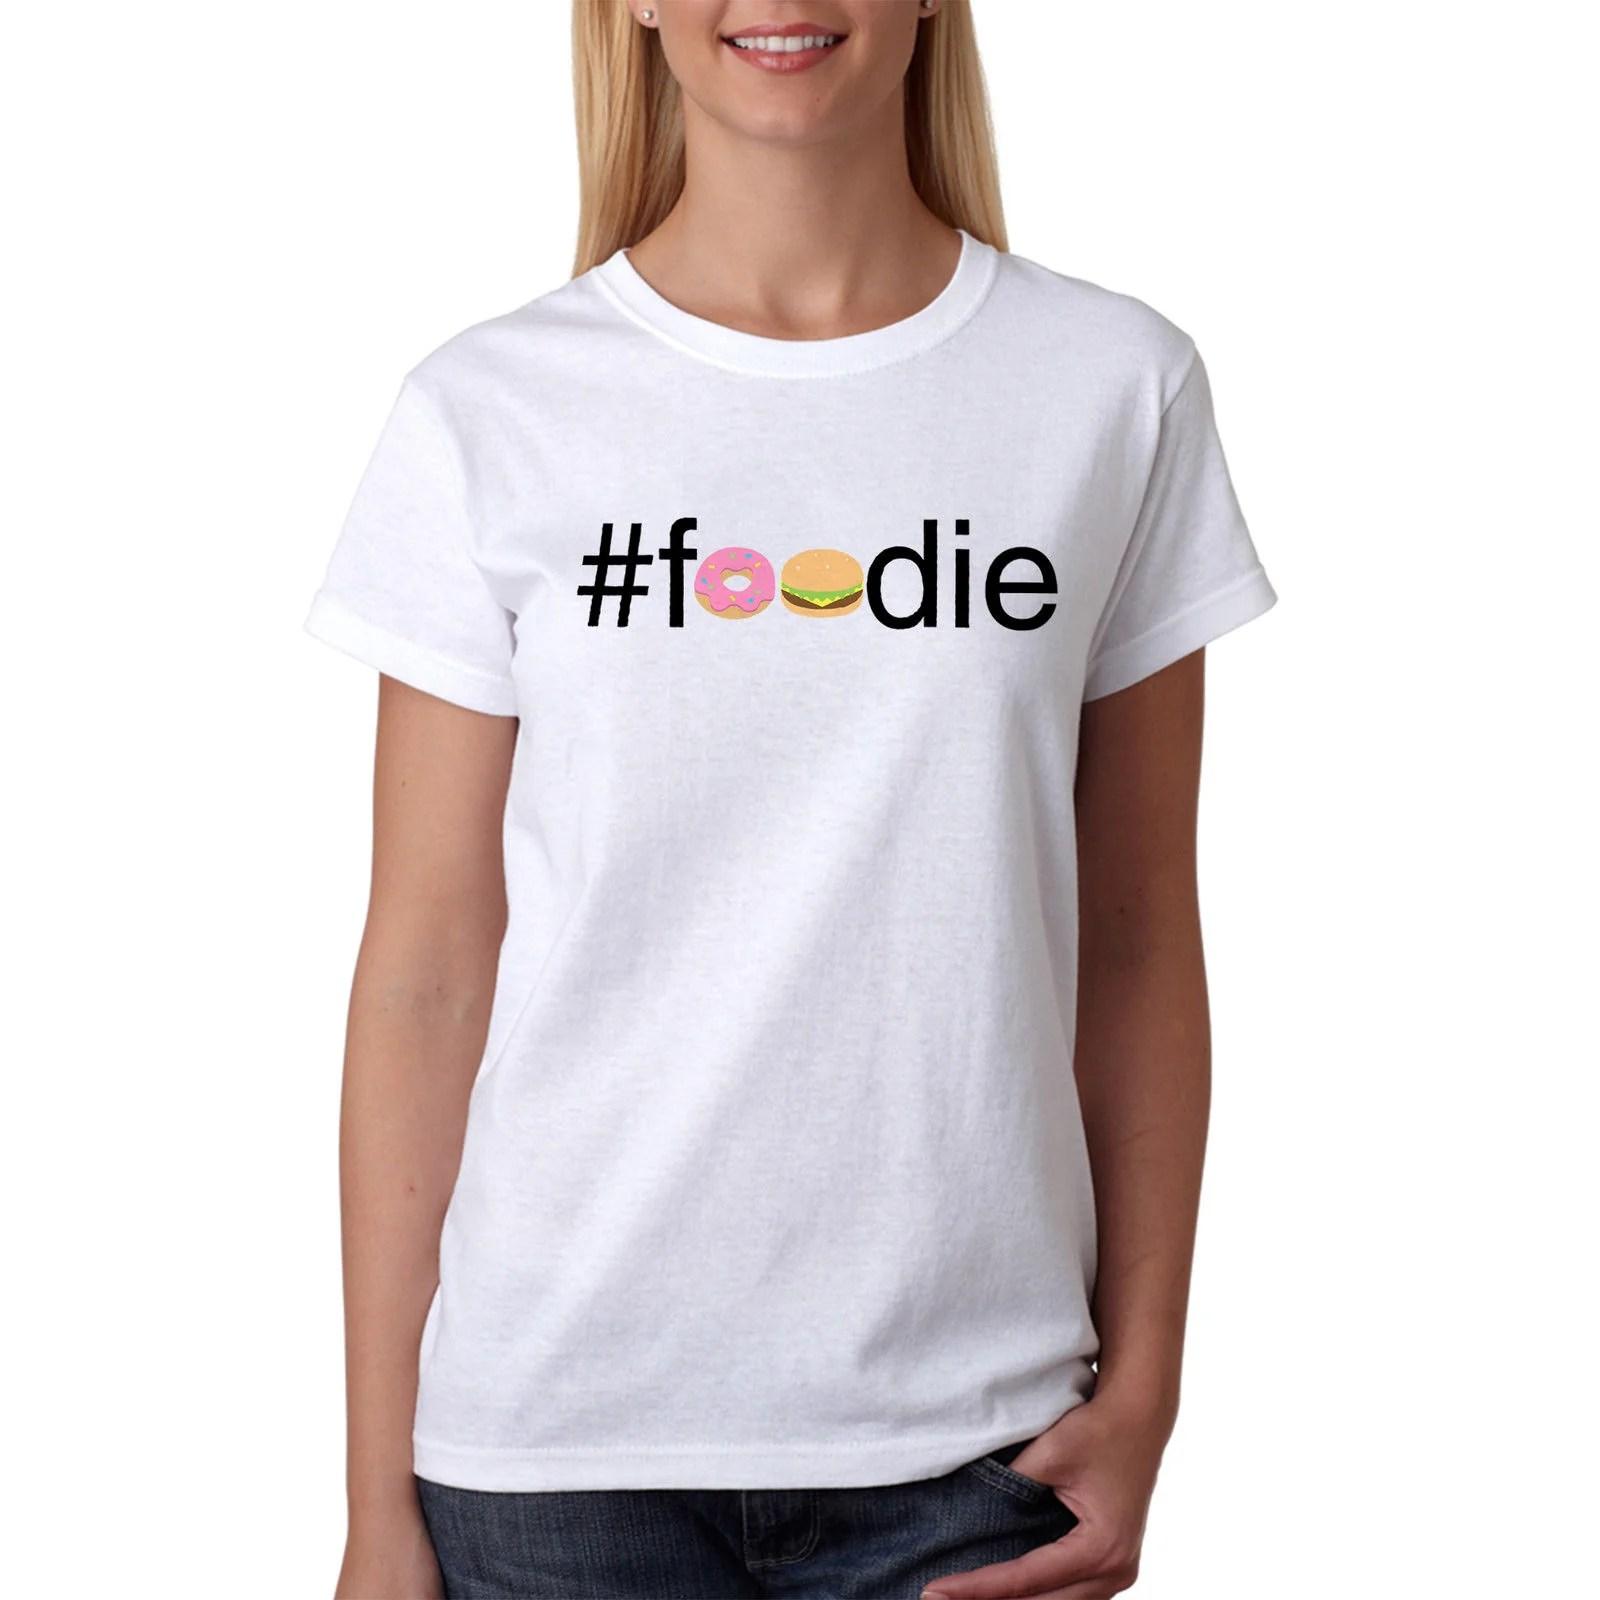 #Foodie Emoji Images Women's White T-Shirt NEW Sizes S-XL Feminist Looks Like New Fashion White Print Cotton T Shirt White Style